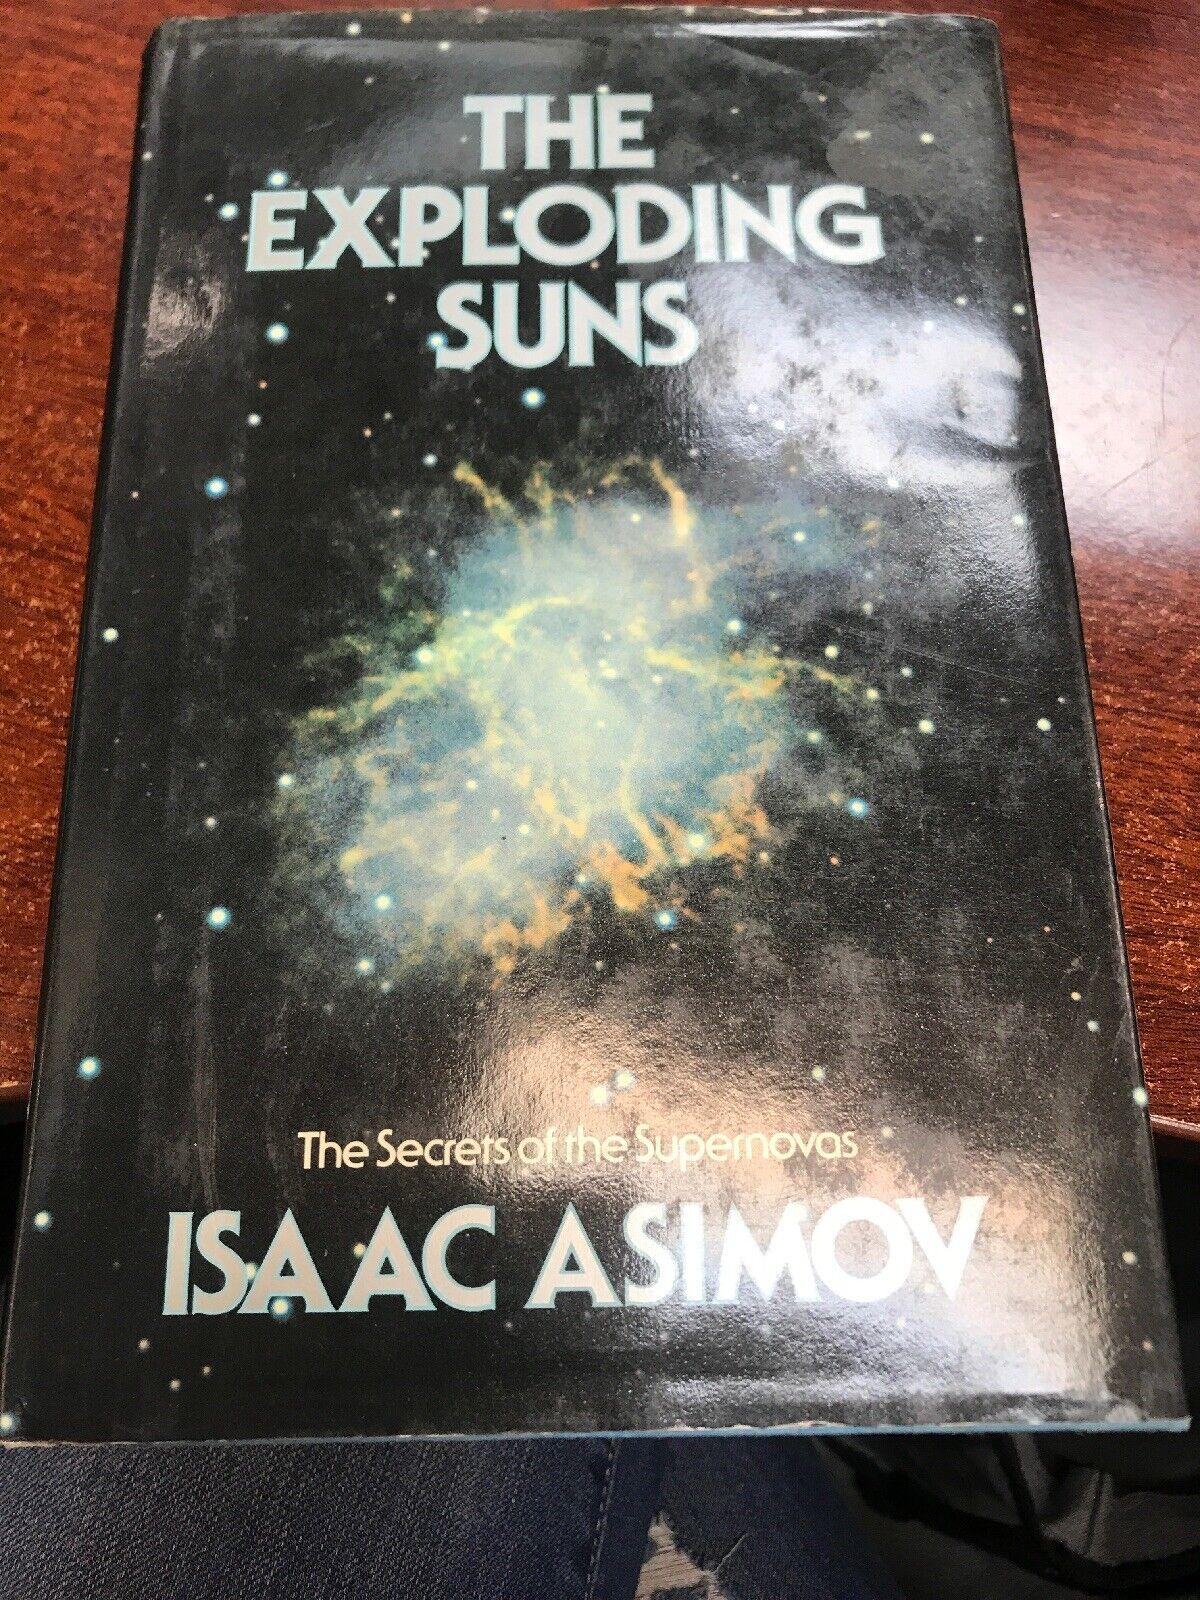 The Exploding Suns: The Secrets of the Supernovas